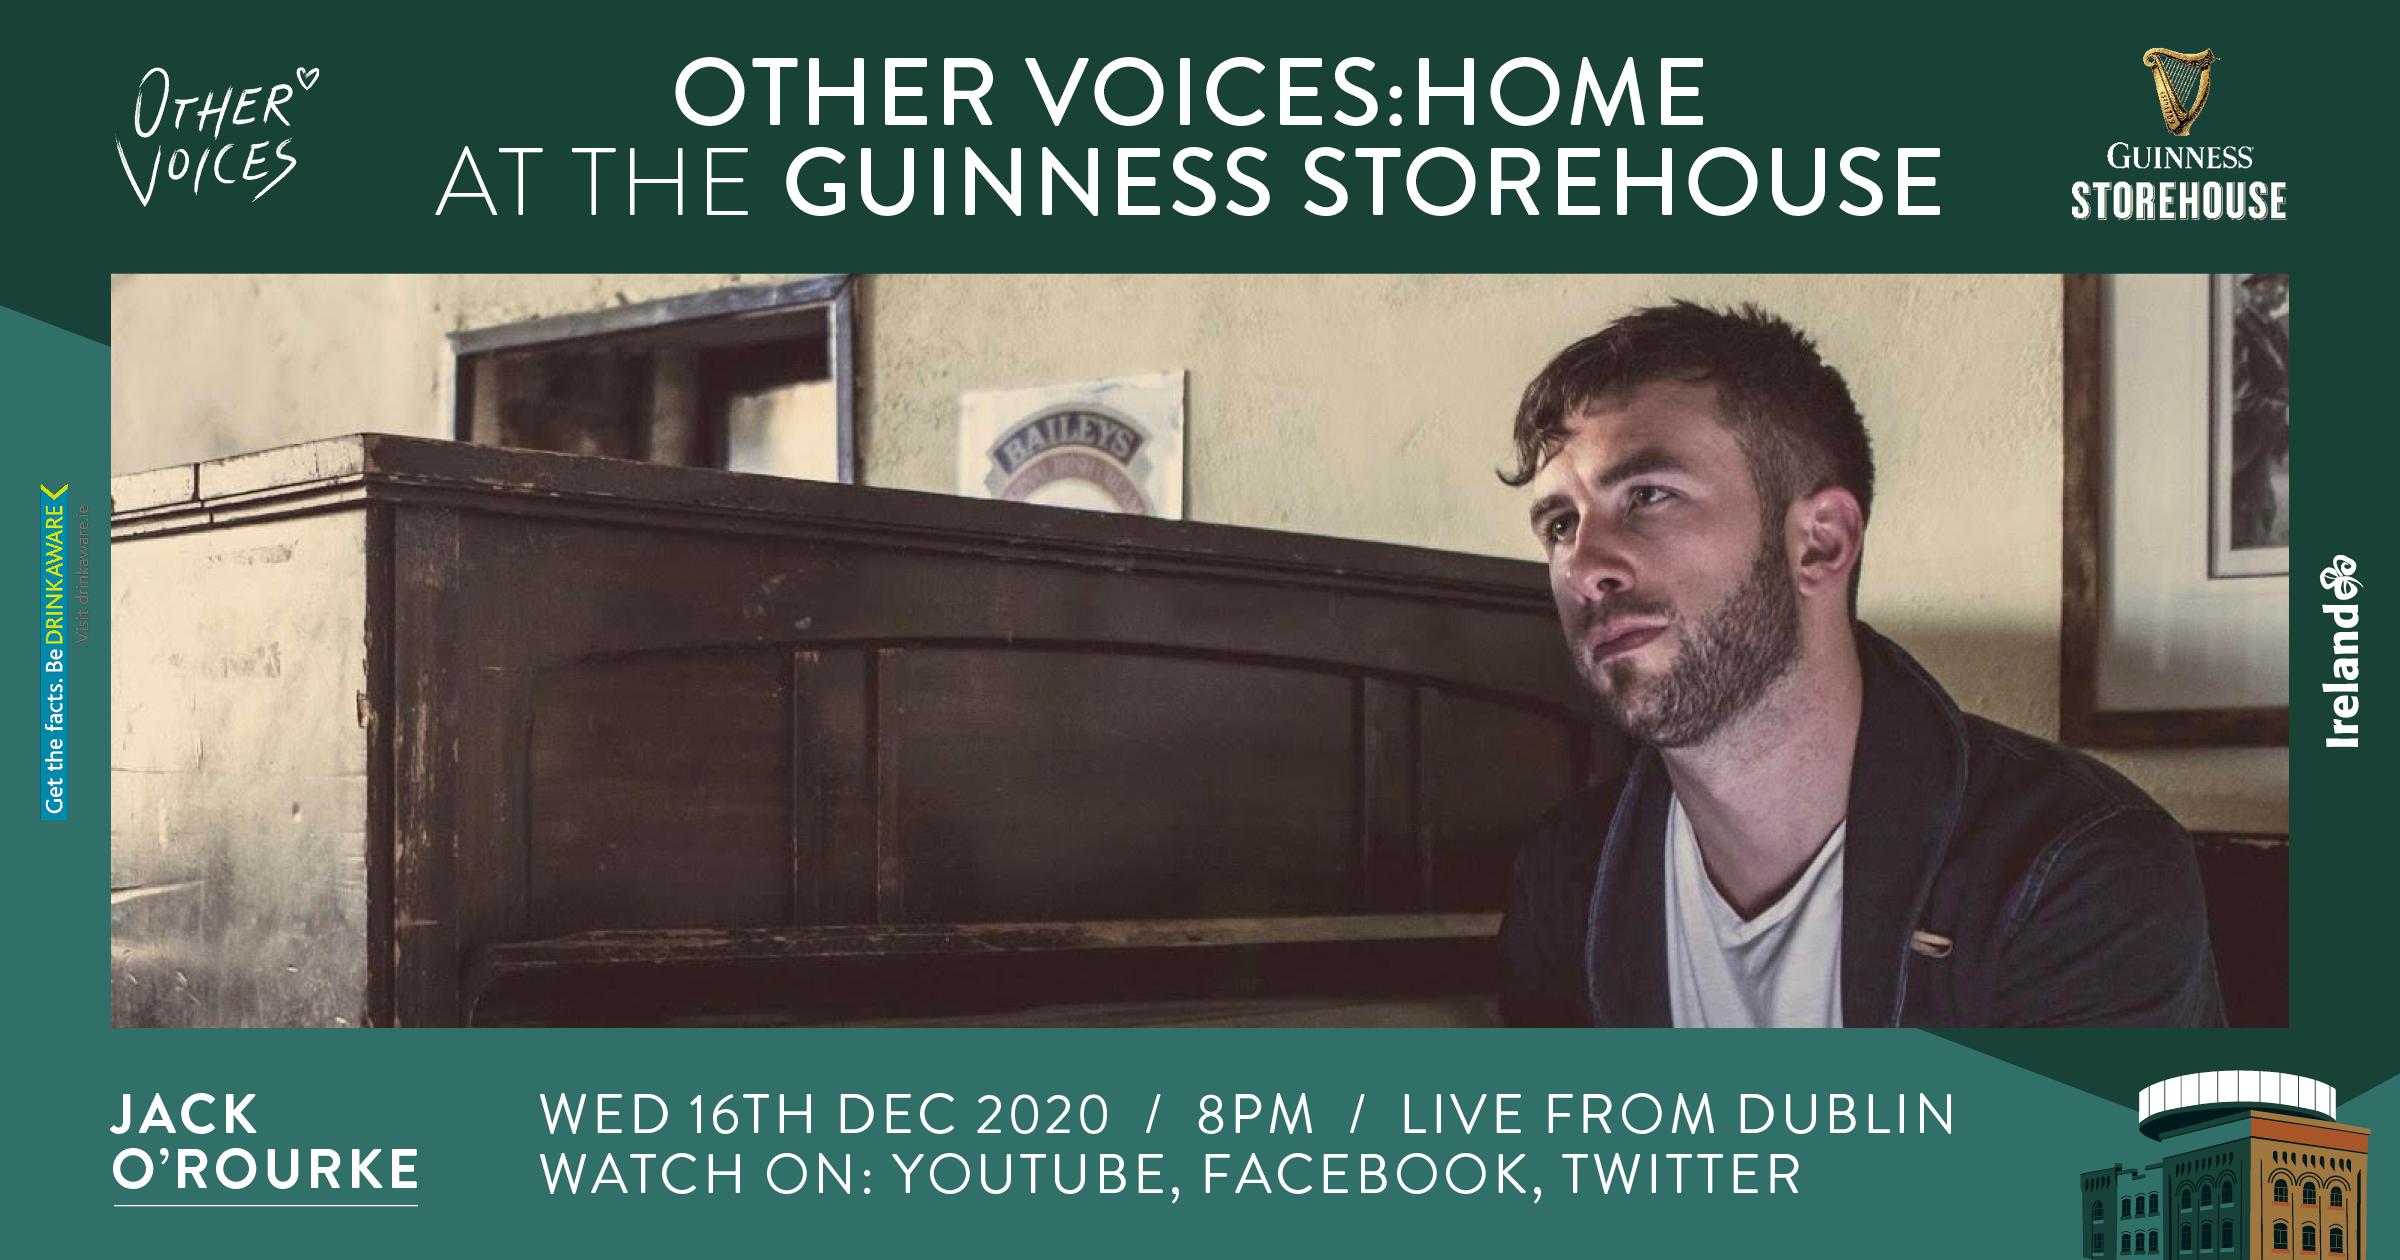 Jack O'Rourke :: OV Home playlist